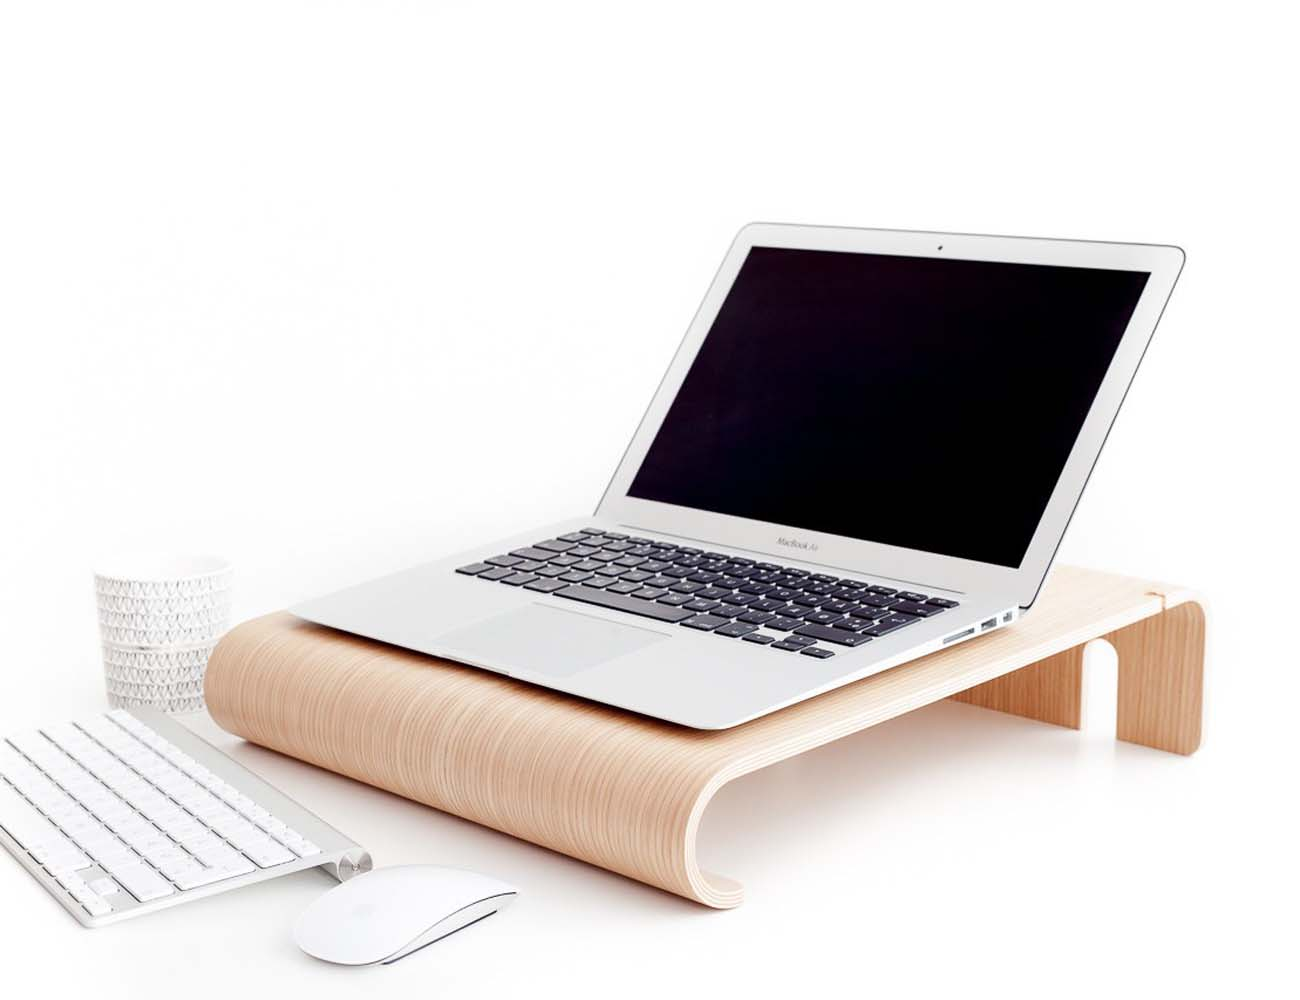 The MacBook Wall Desk